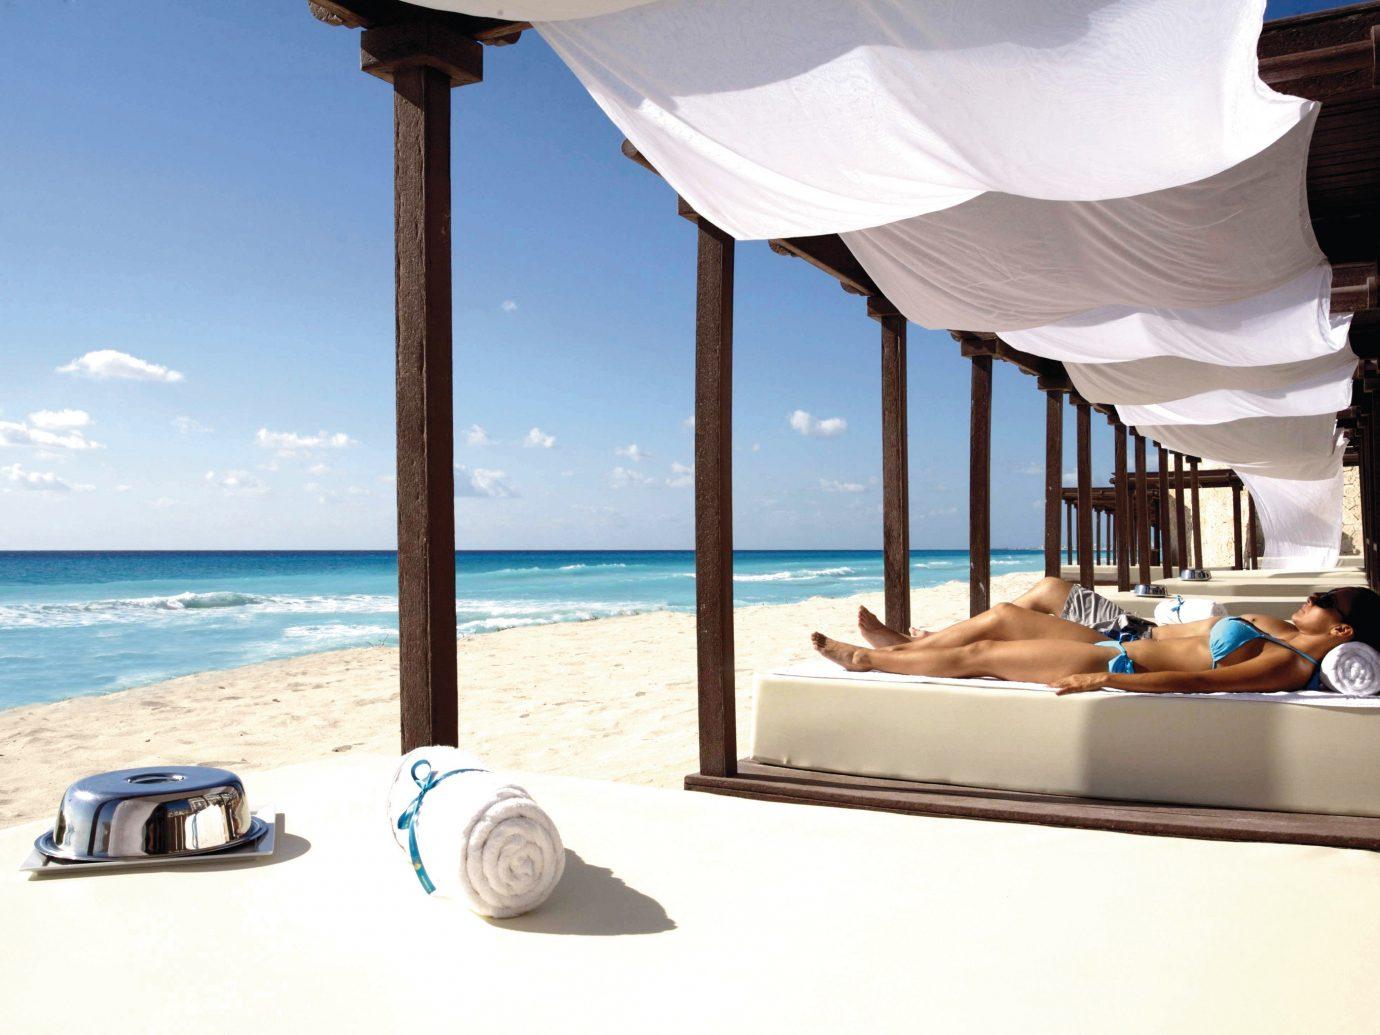 Hotels outdoor Sea vacation window Resort hotel interior design shore